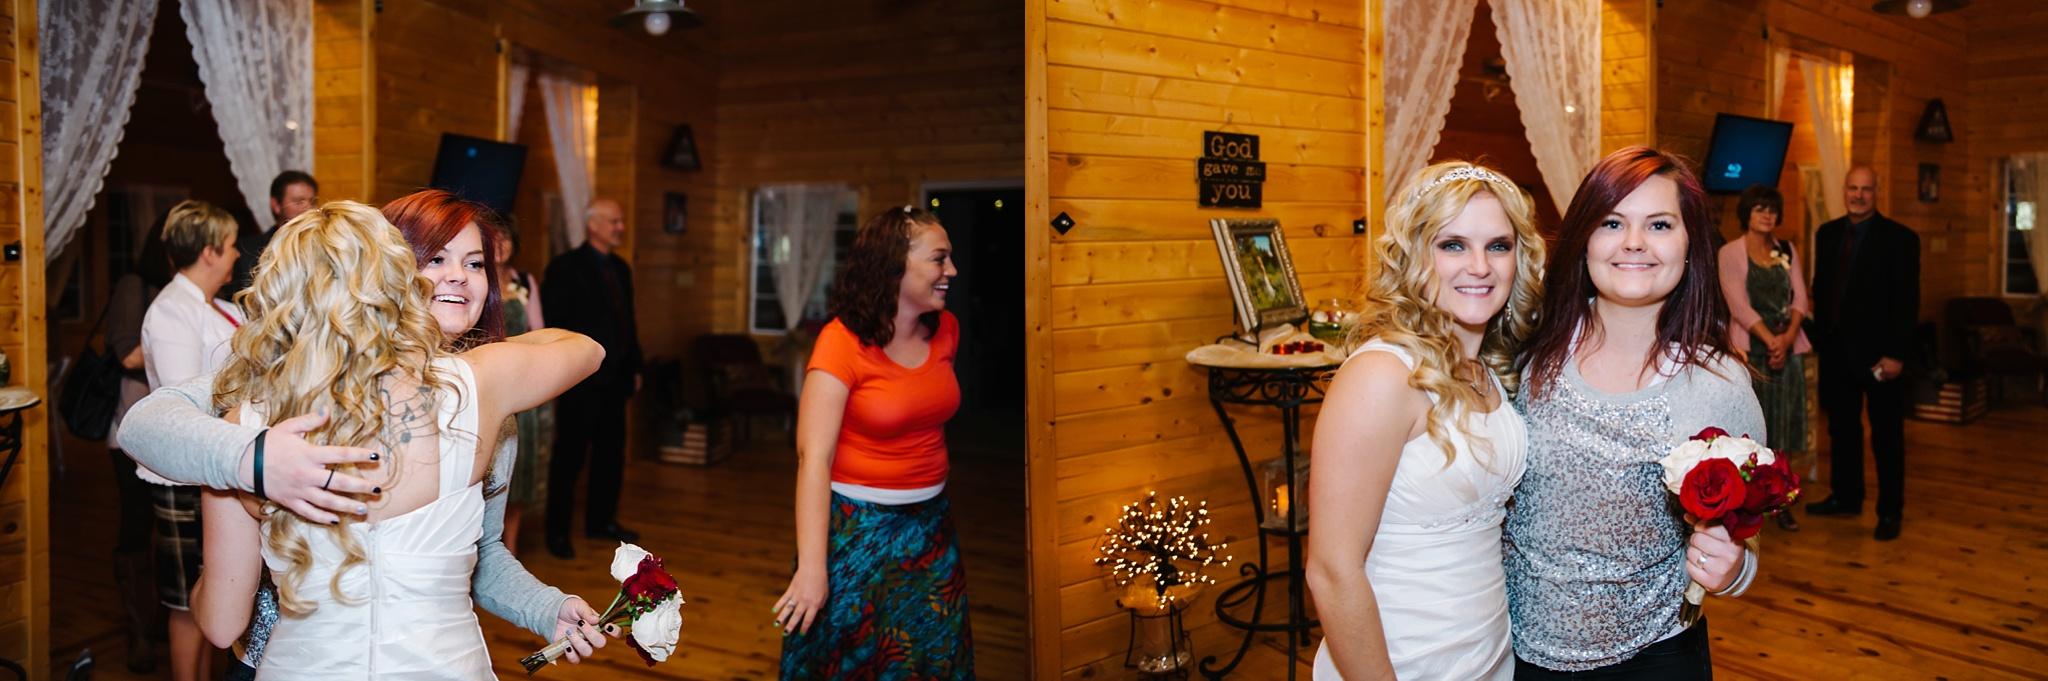 SLC Utah Wedding Photographer Ali Sumsion 134